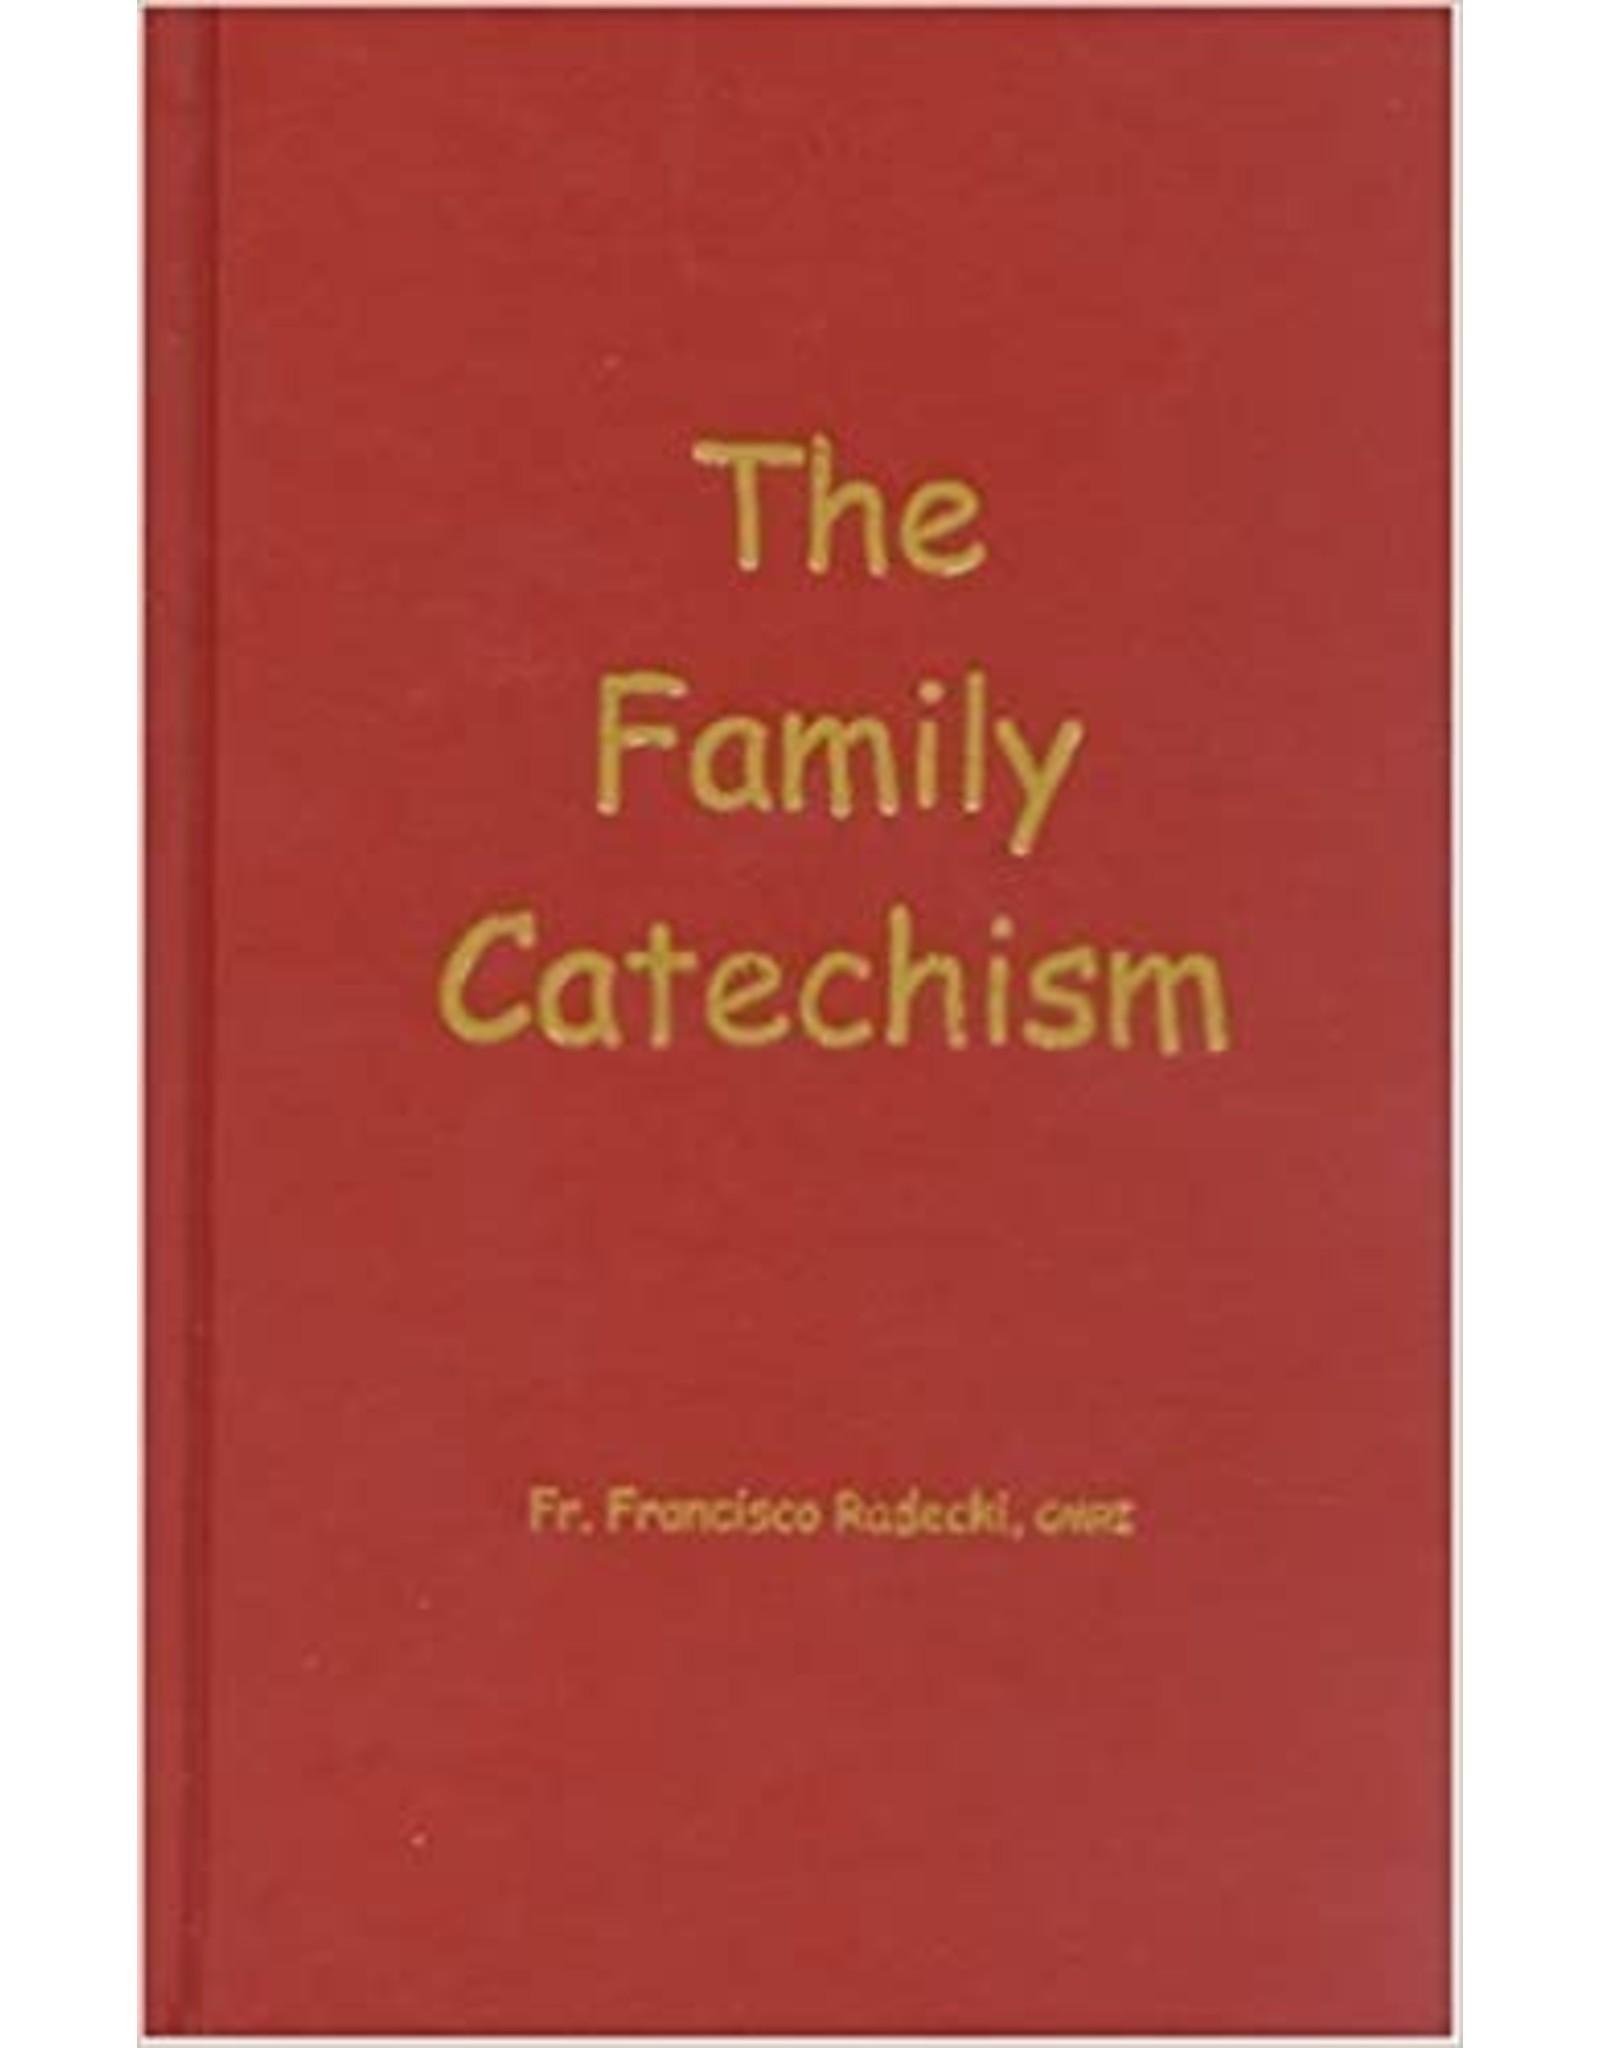 St. Joseph's Media A Family Catechism by Fr. Francisco Radecki, CMRI